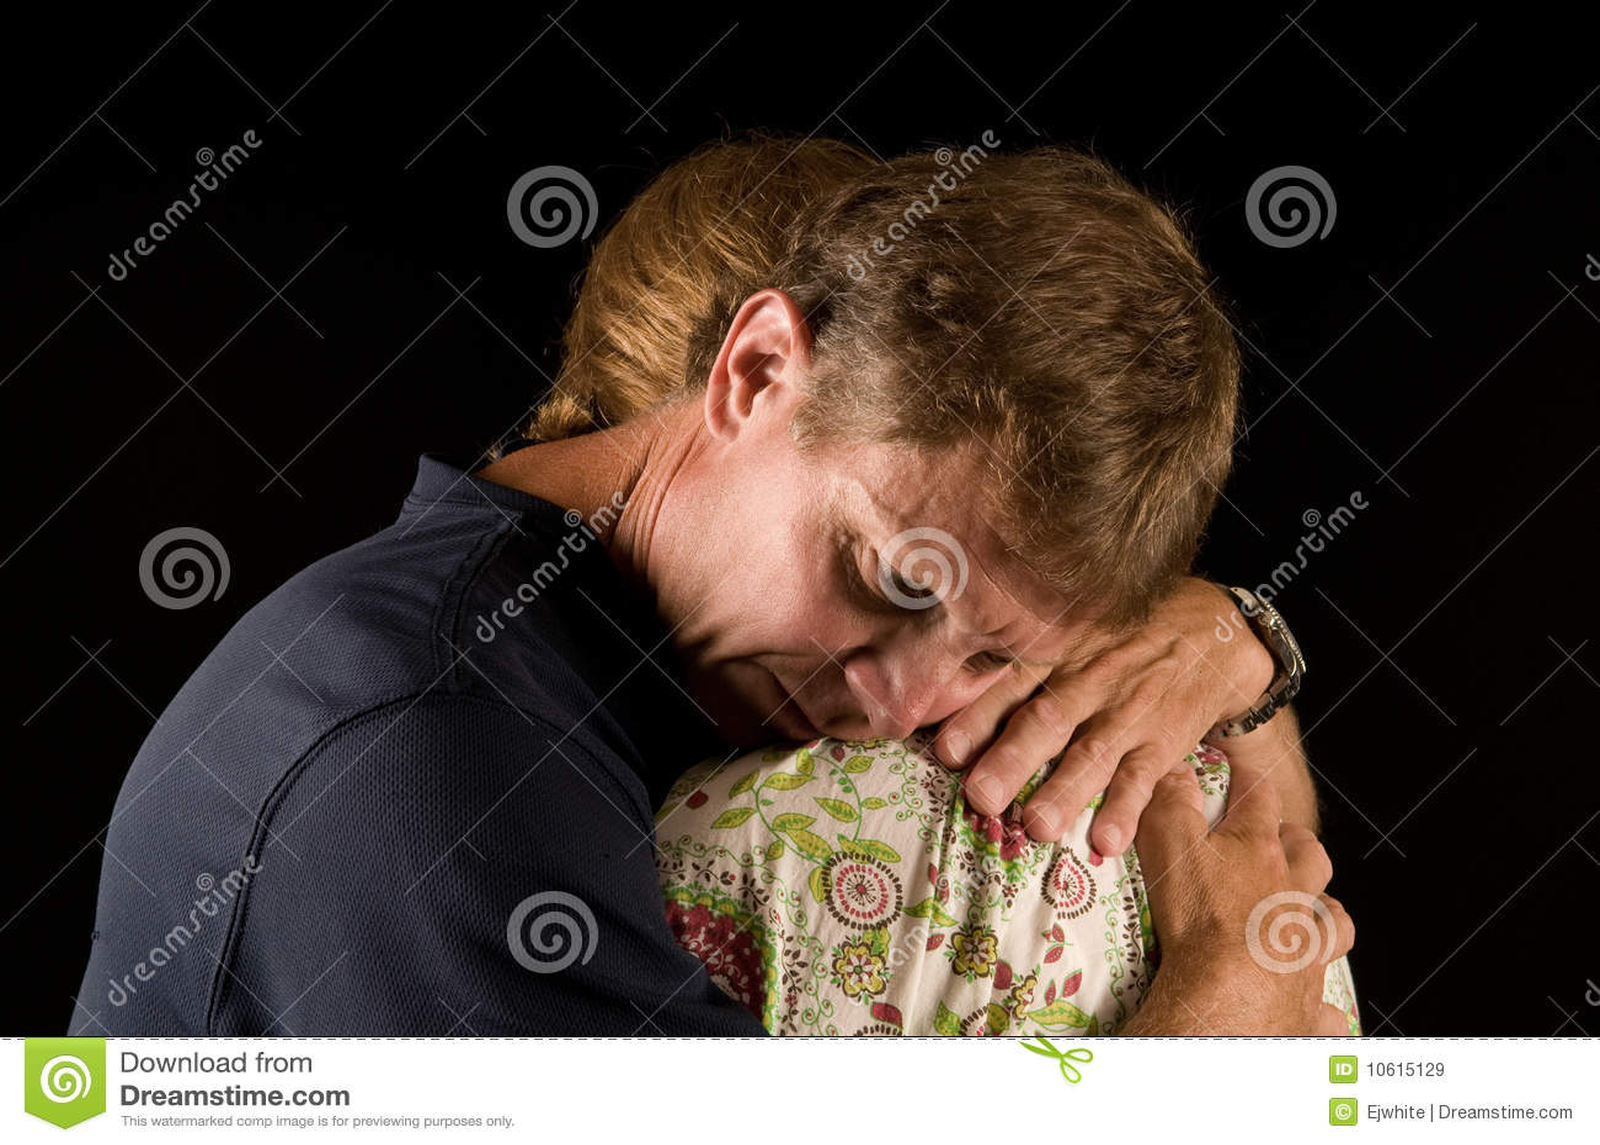 Painful embrace